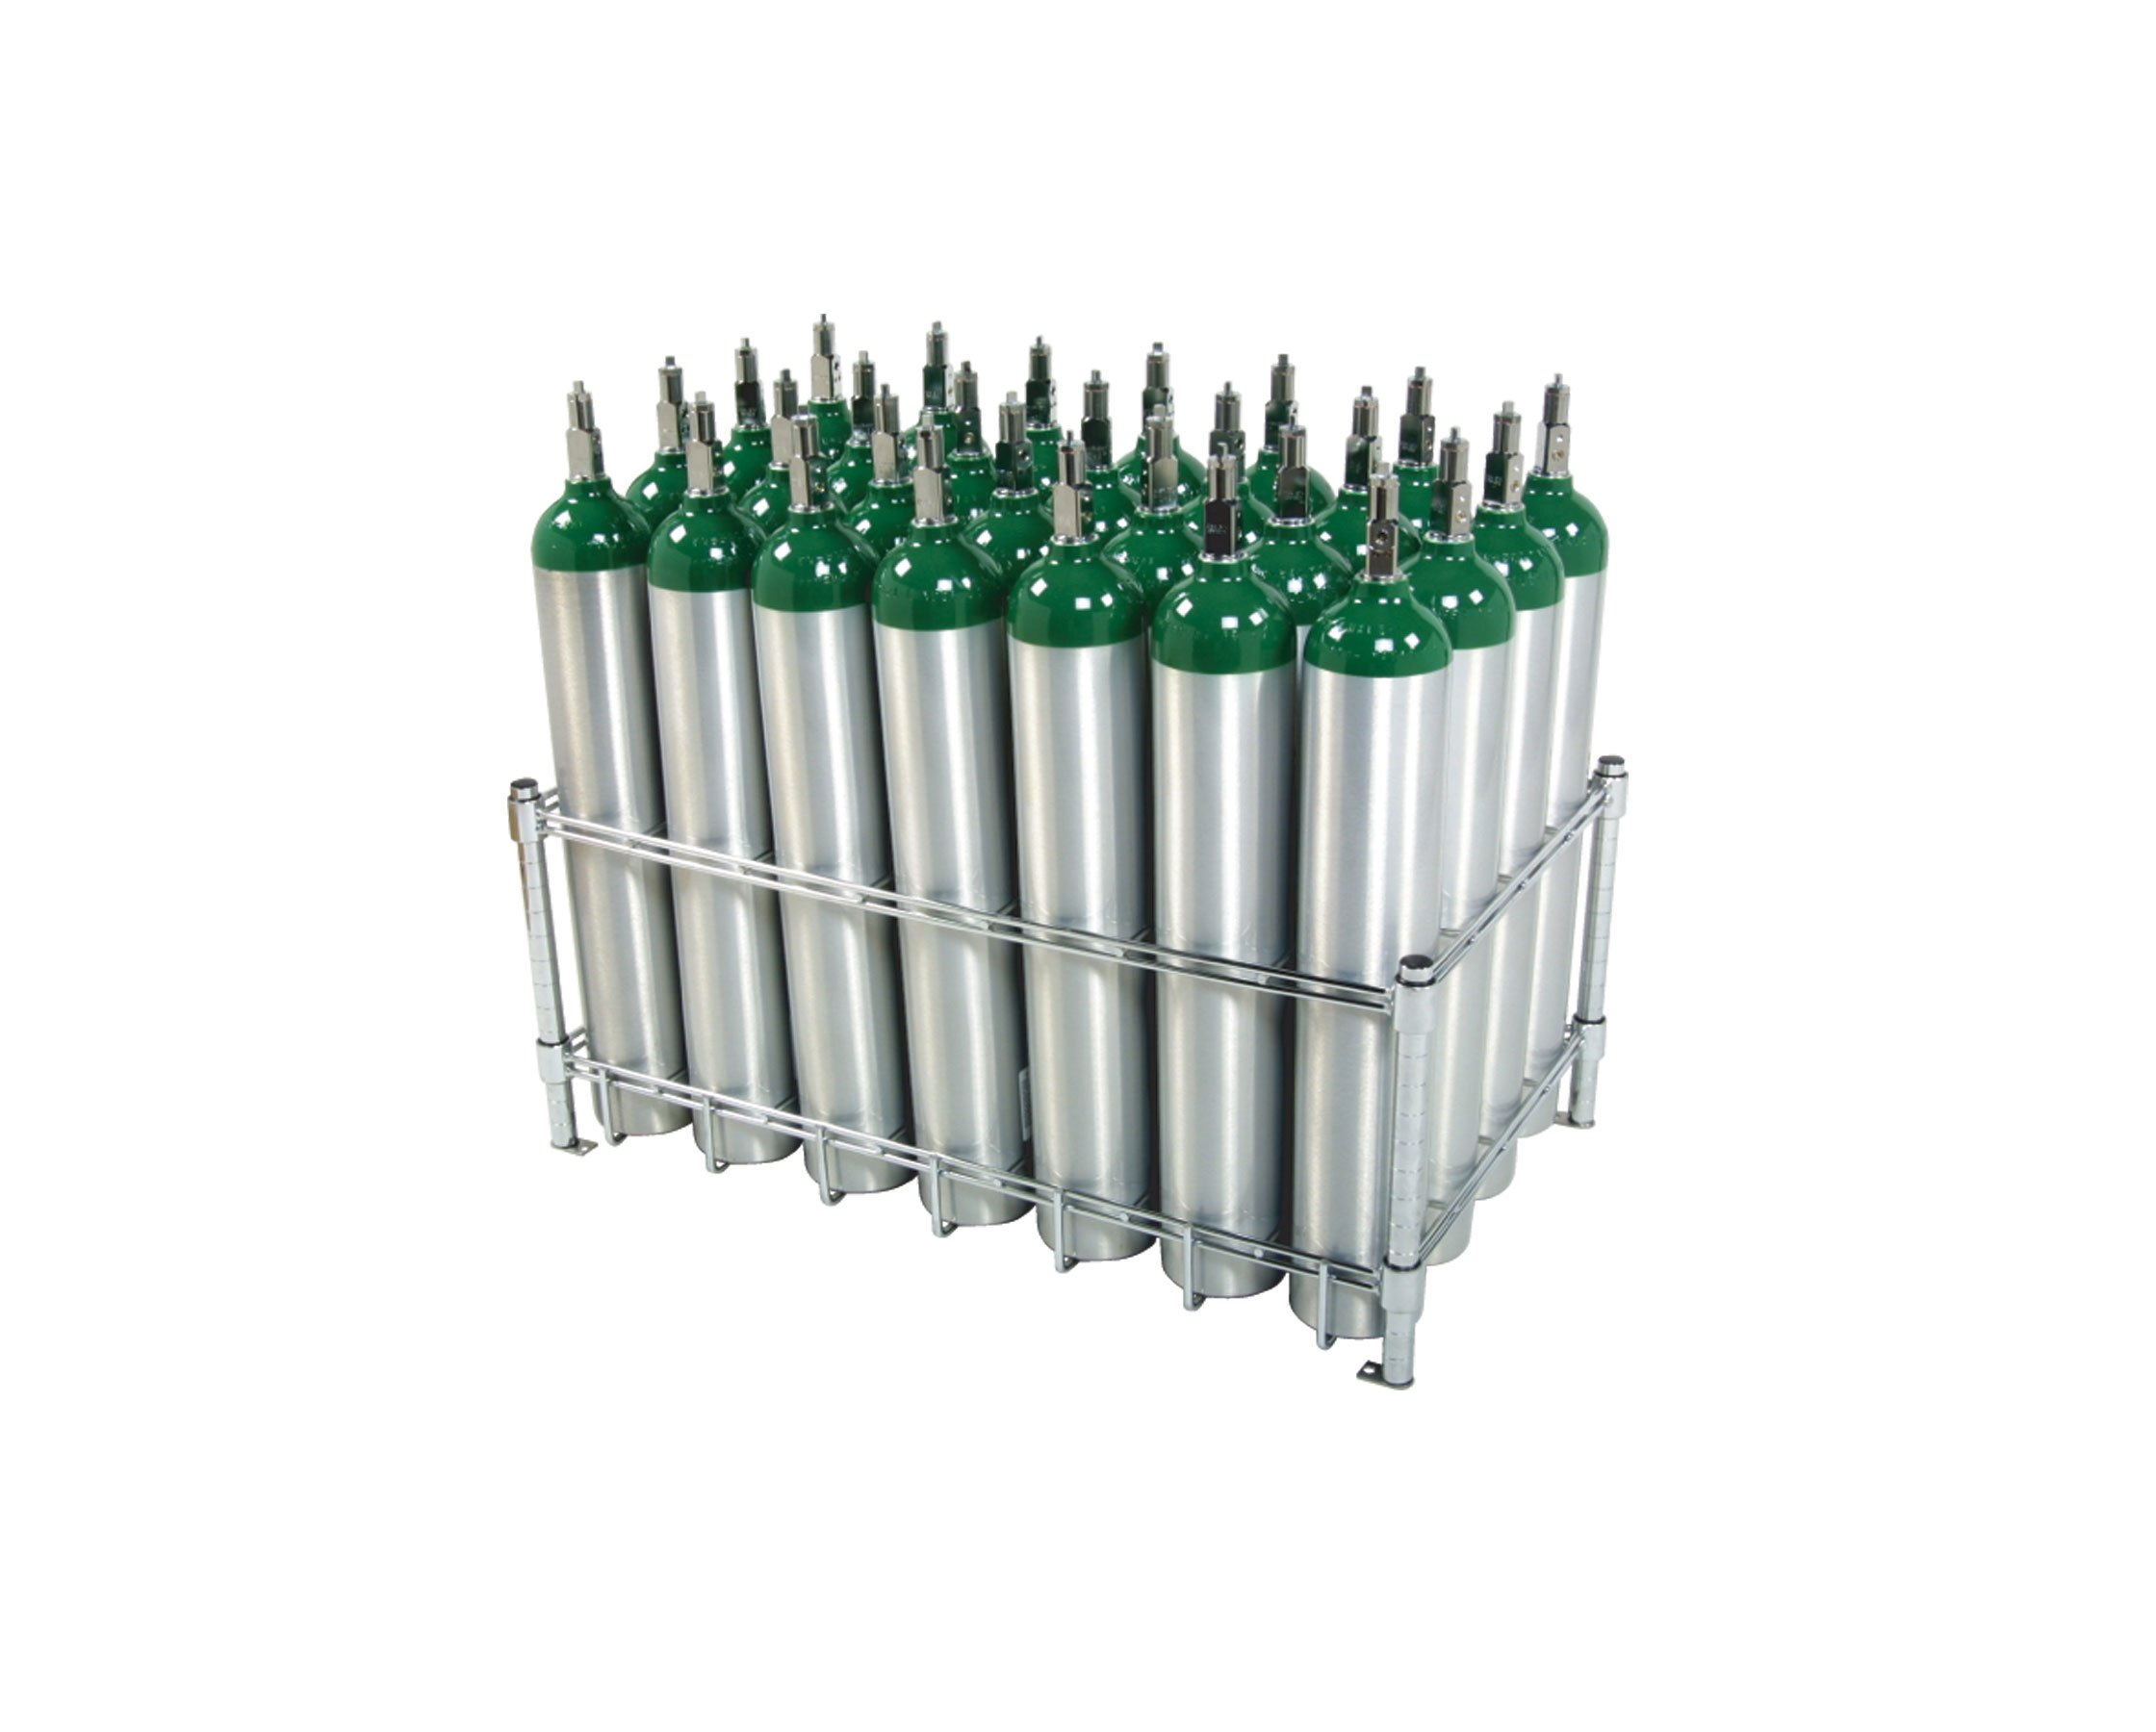 Stack & Rack Oxygen Tank Storage Rack - Holds 28 E Size Cylinders